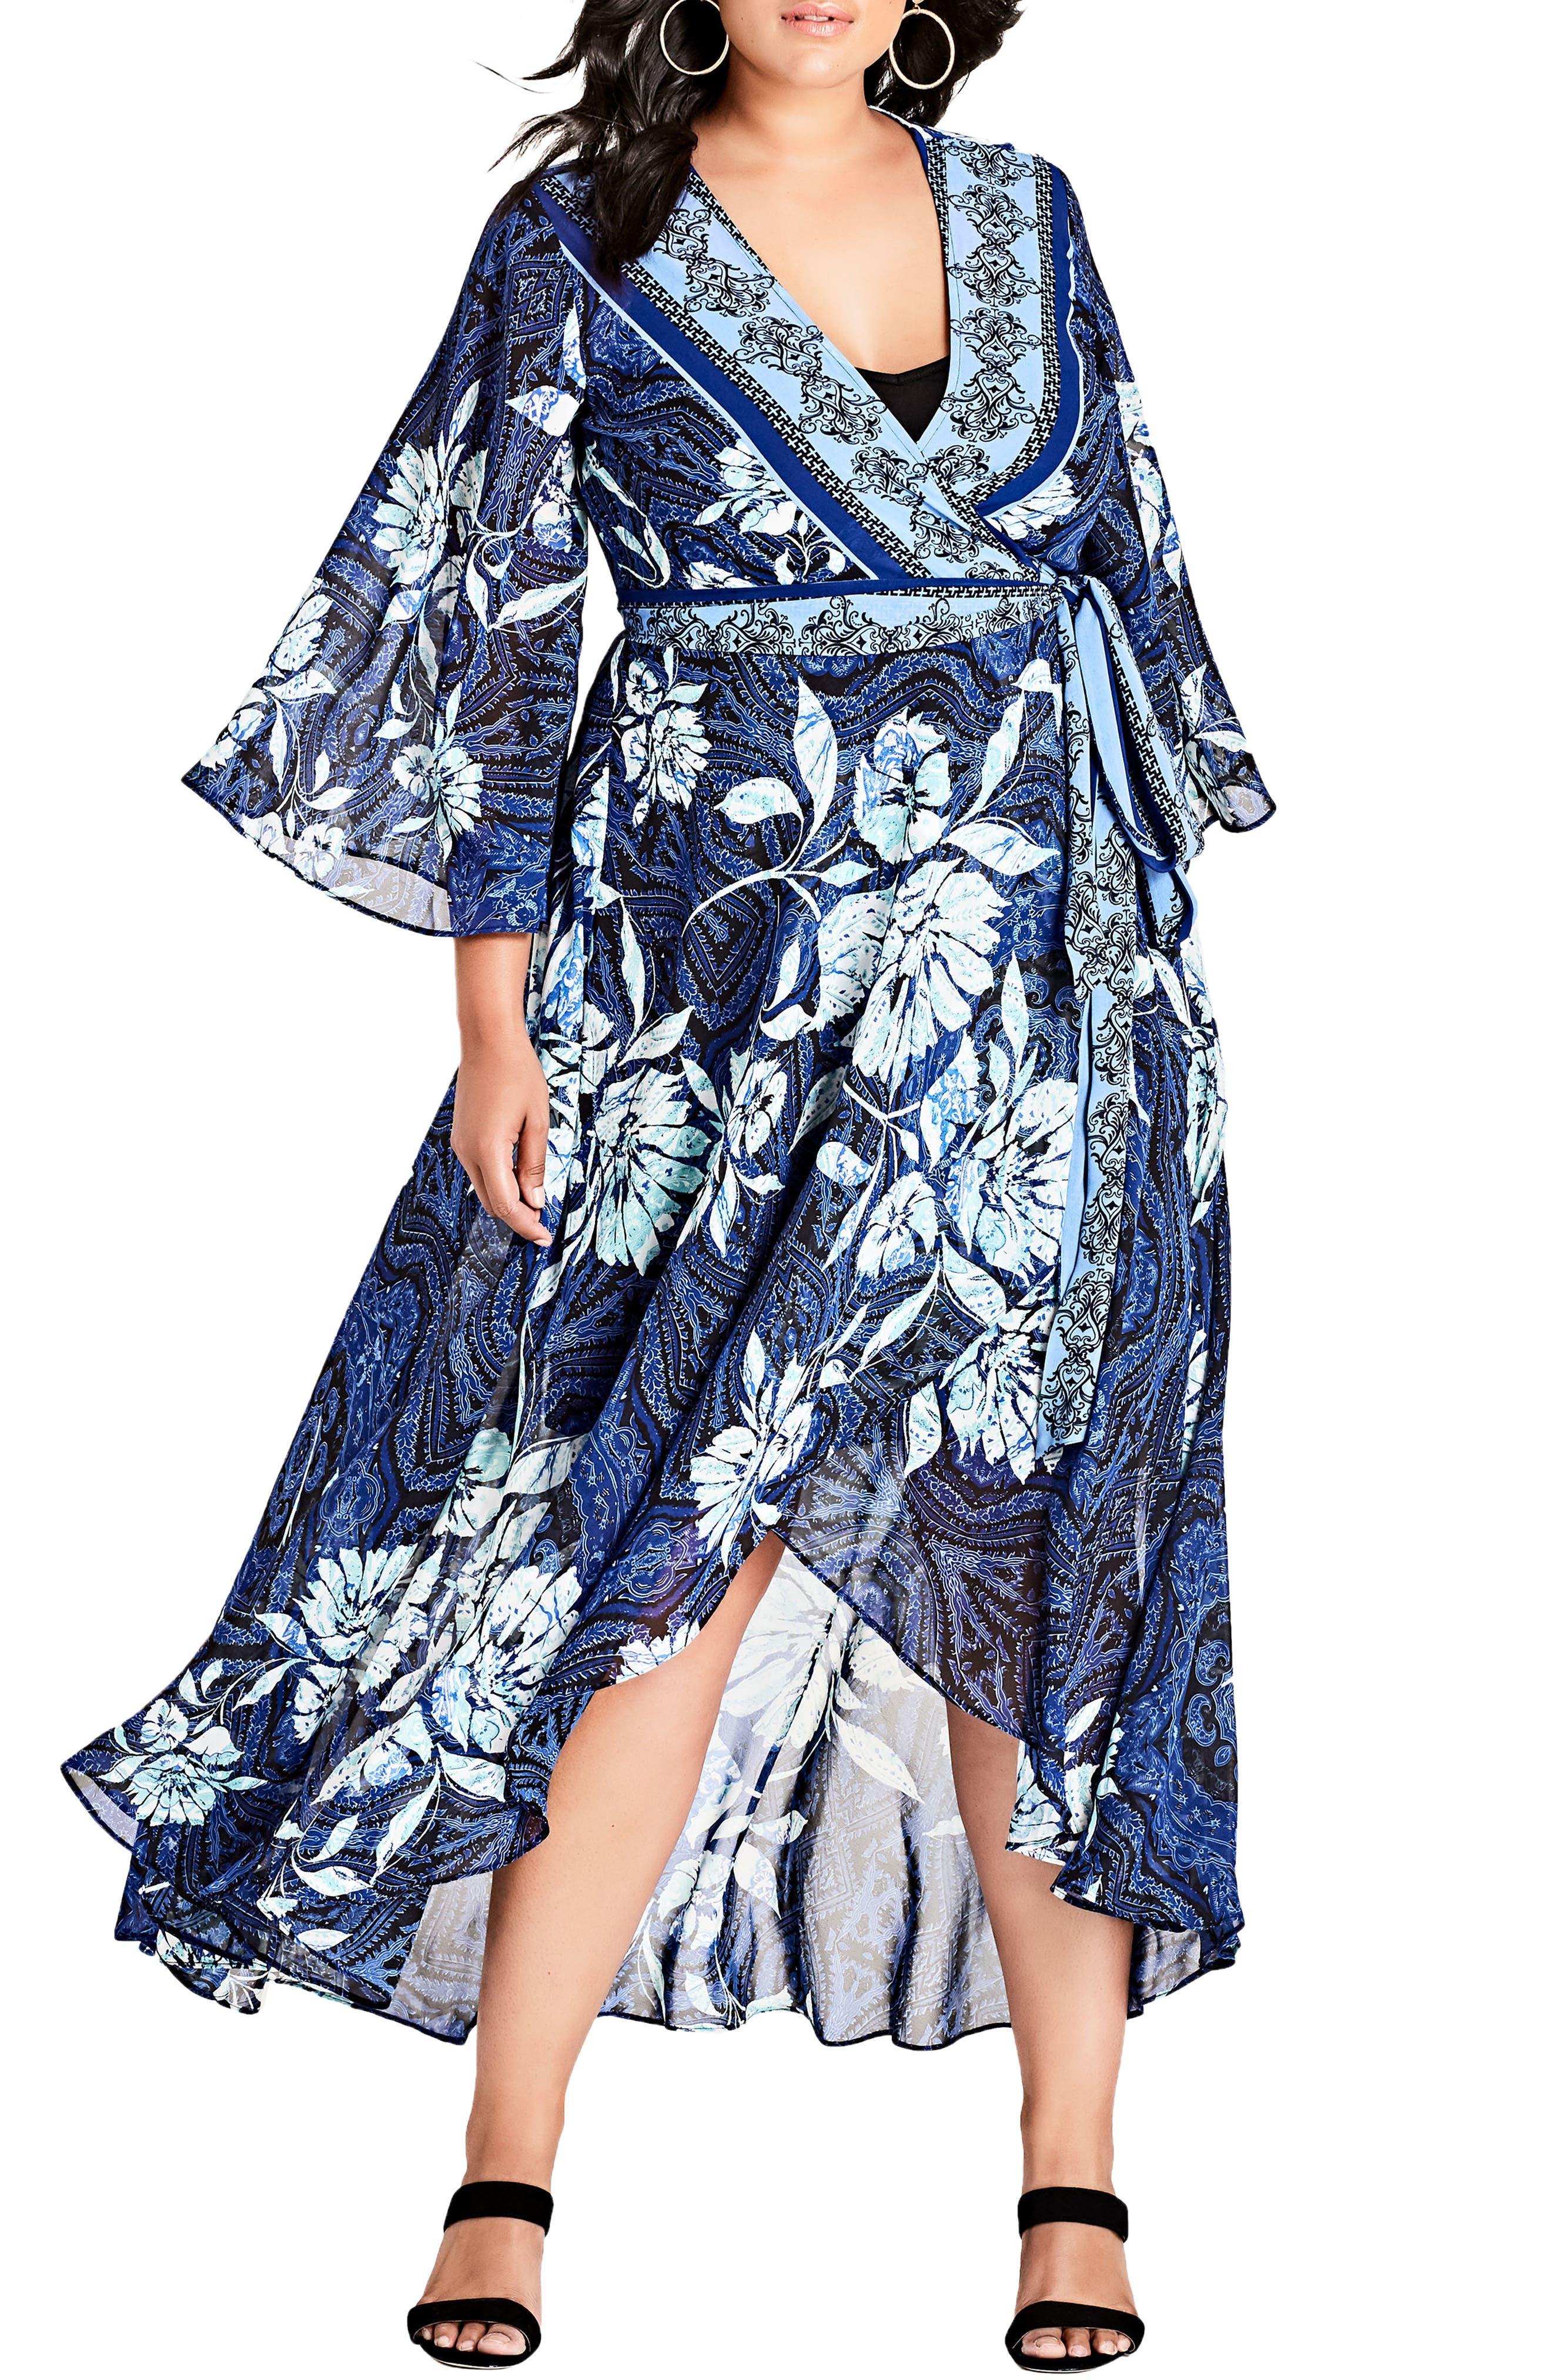 Blue Illusion High/Low Wrap Dress,                             Alternate thumbnail 4, color,                             BLUE ILLUSION